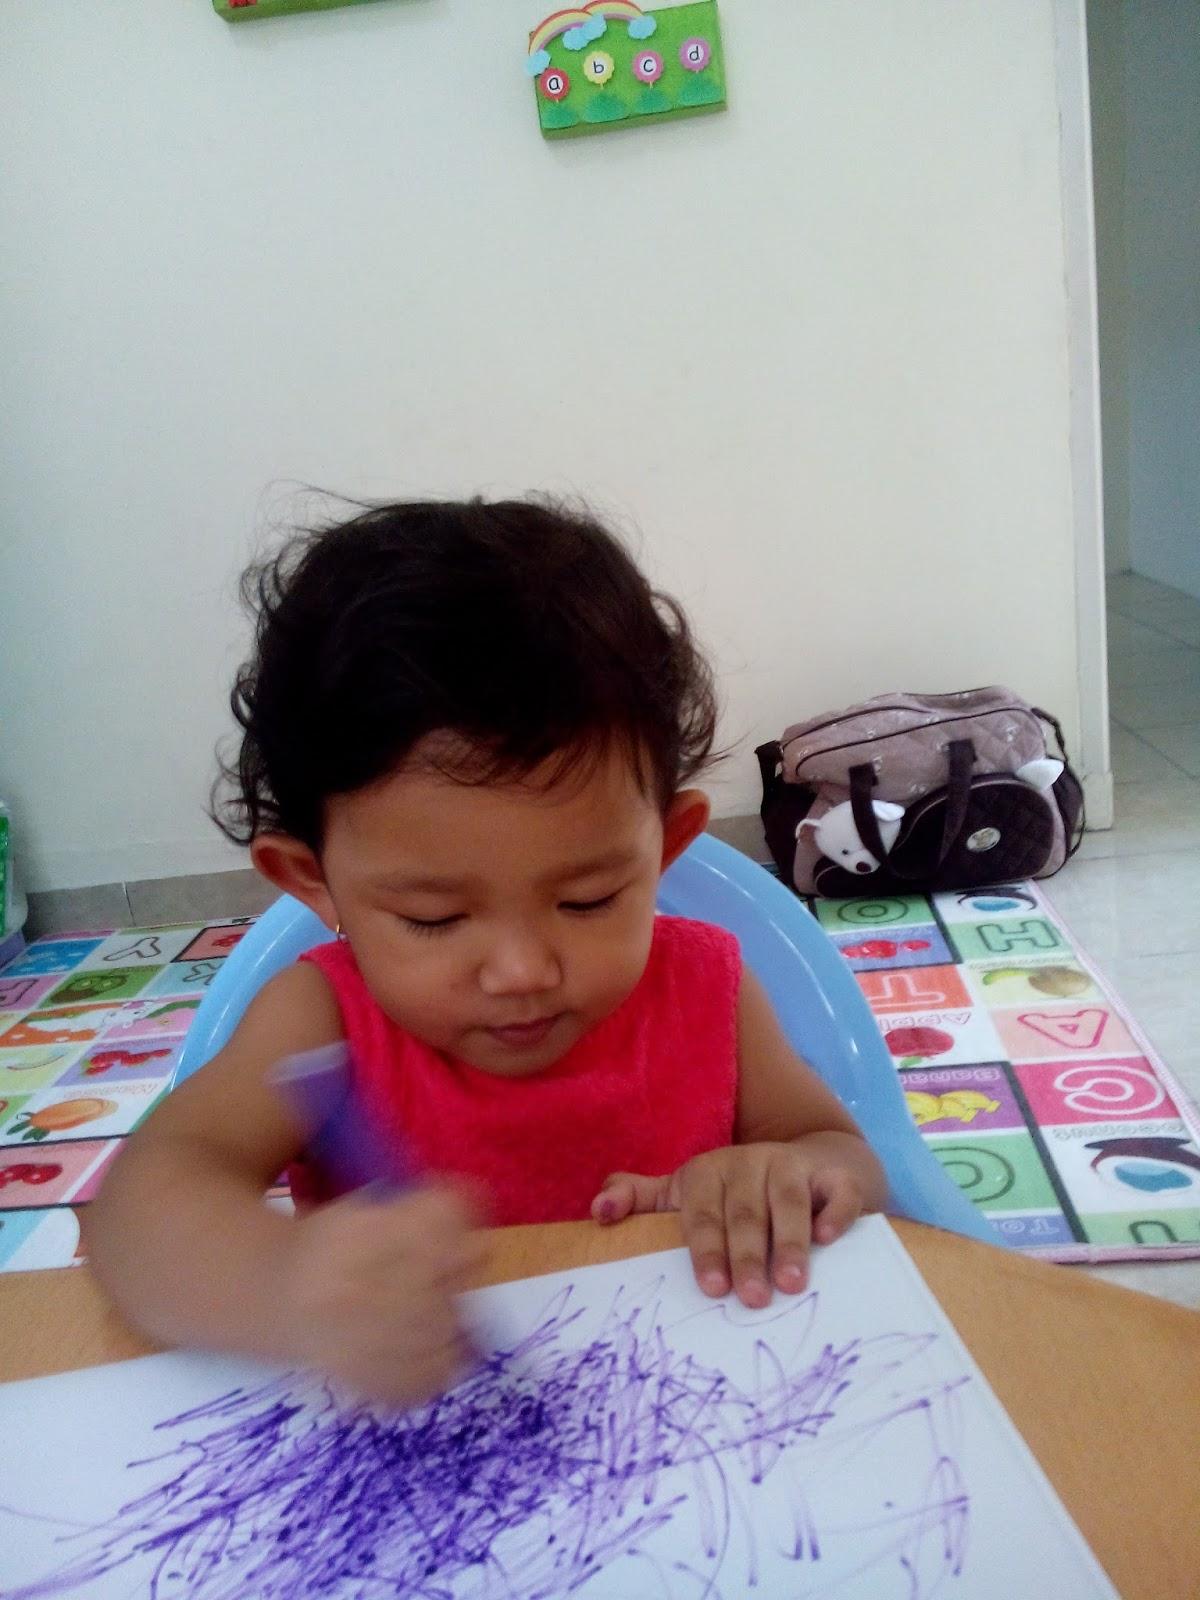 HfSD memperkenalkan sosok R A Kartini dengan cara yang lebih menyenangkan dan kreatif yaitu melalui kegiatan mewarnai